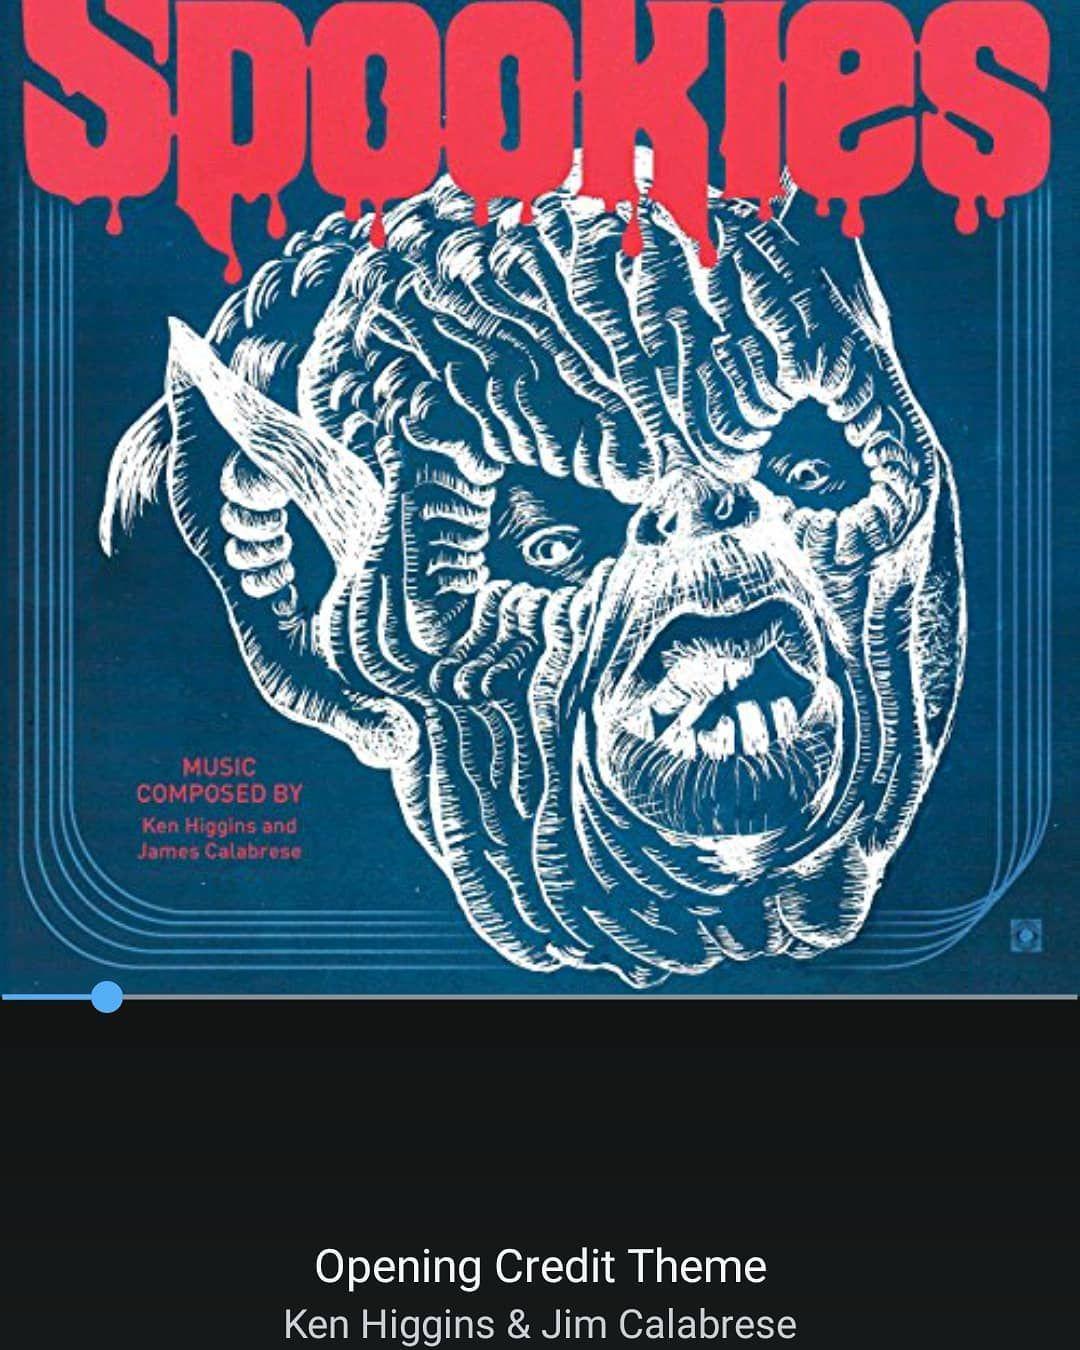 Pizowell On Instagram My Morning Paperwork And Spookies Spookies Horror Horrorfilm Horrorfanatic Horrorlovers Cool Things To Buy Lp Vinyl Soundtrack